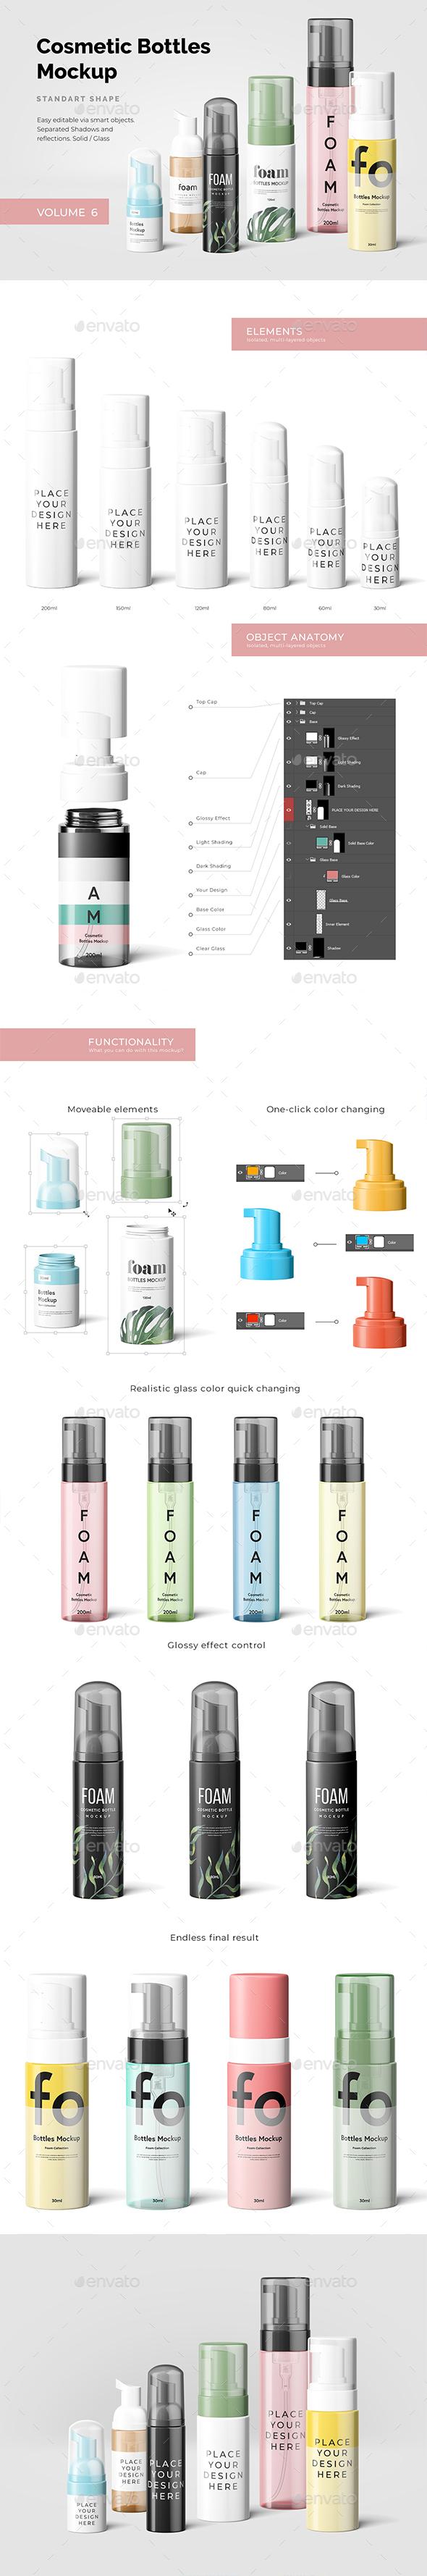 Cosmetic Bottles Mockup Vol.6 - Beauty Packaging